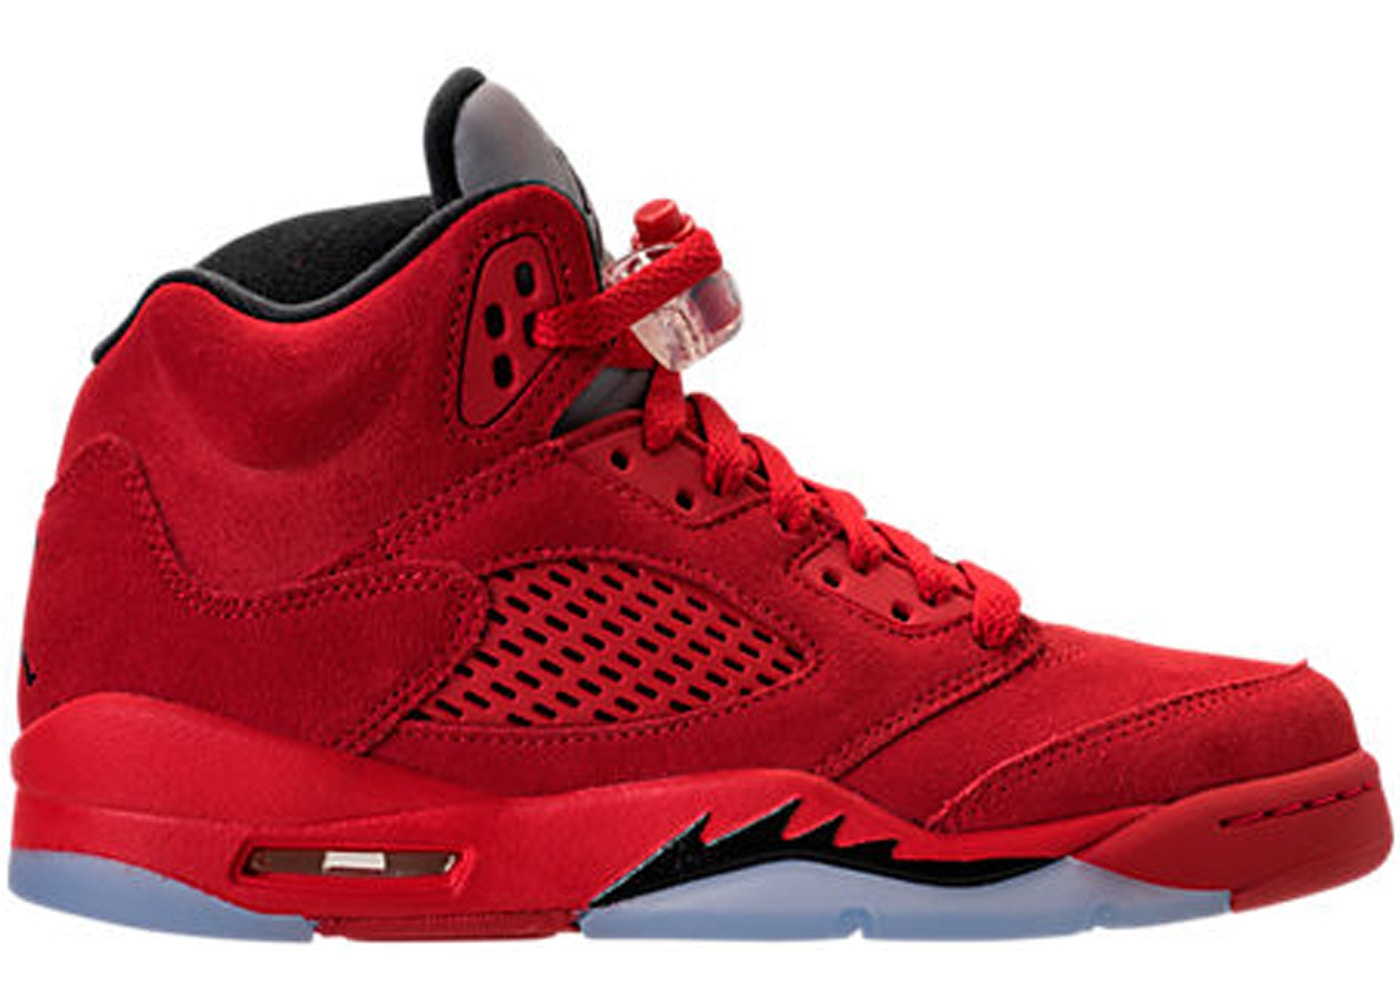 1fdc670f2aa76 Buy Air Jordan 5 Shoes & Deadstock Sneakers